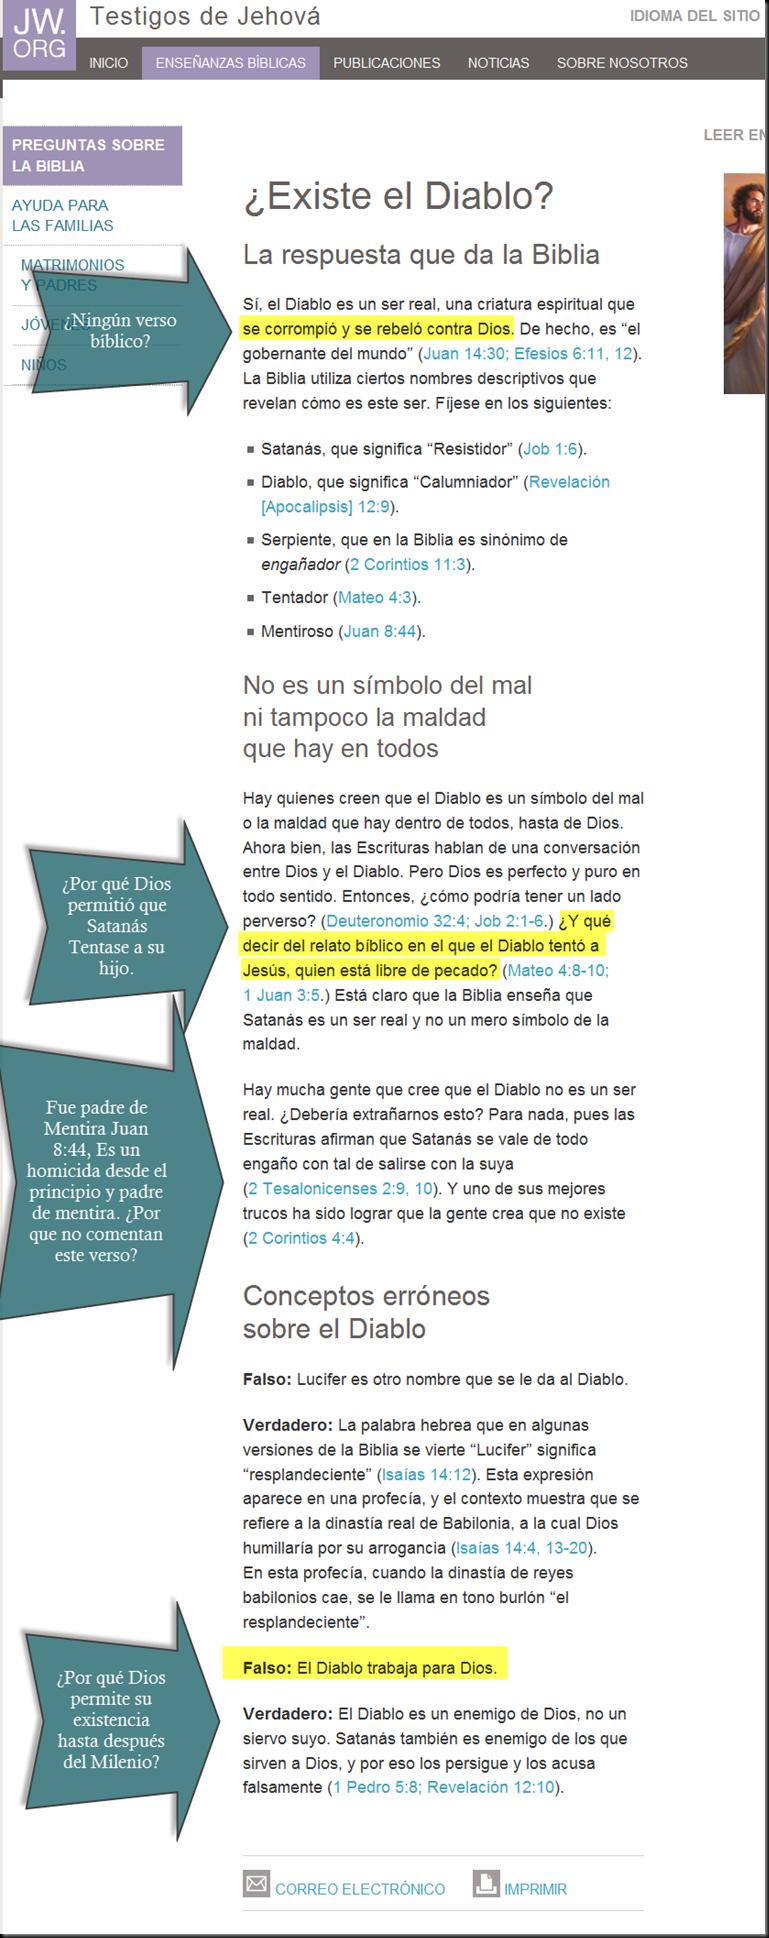 A examen: ¿Existe el diablo? (Testigos de Jehová) Image_thumb13